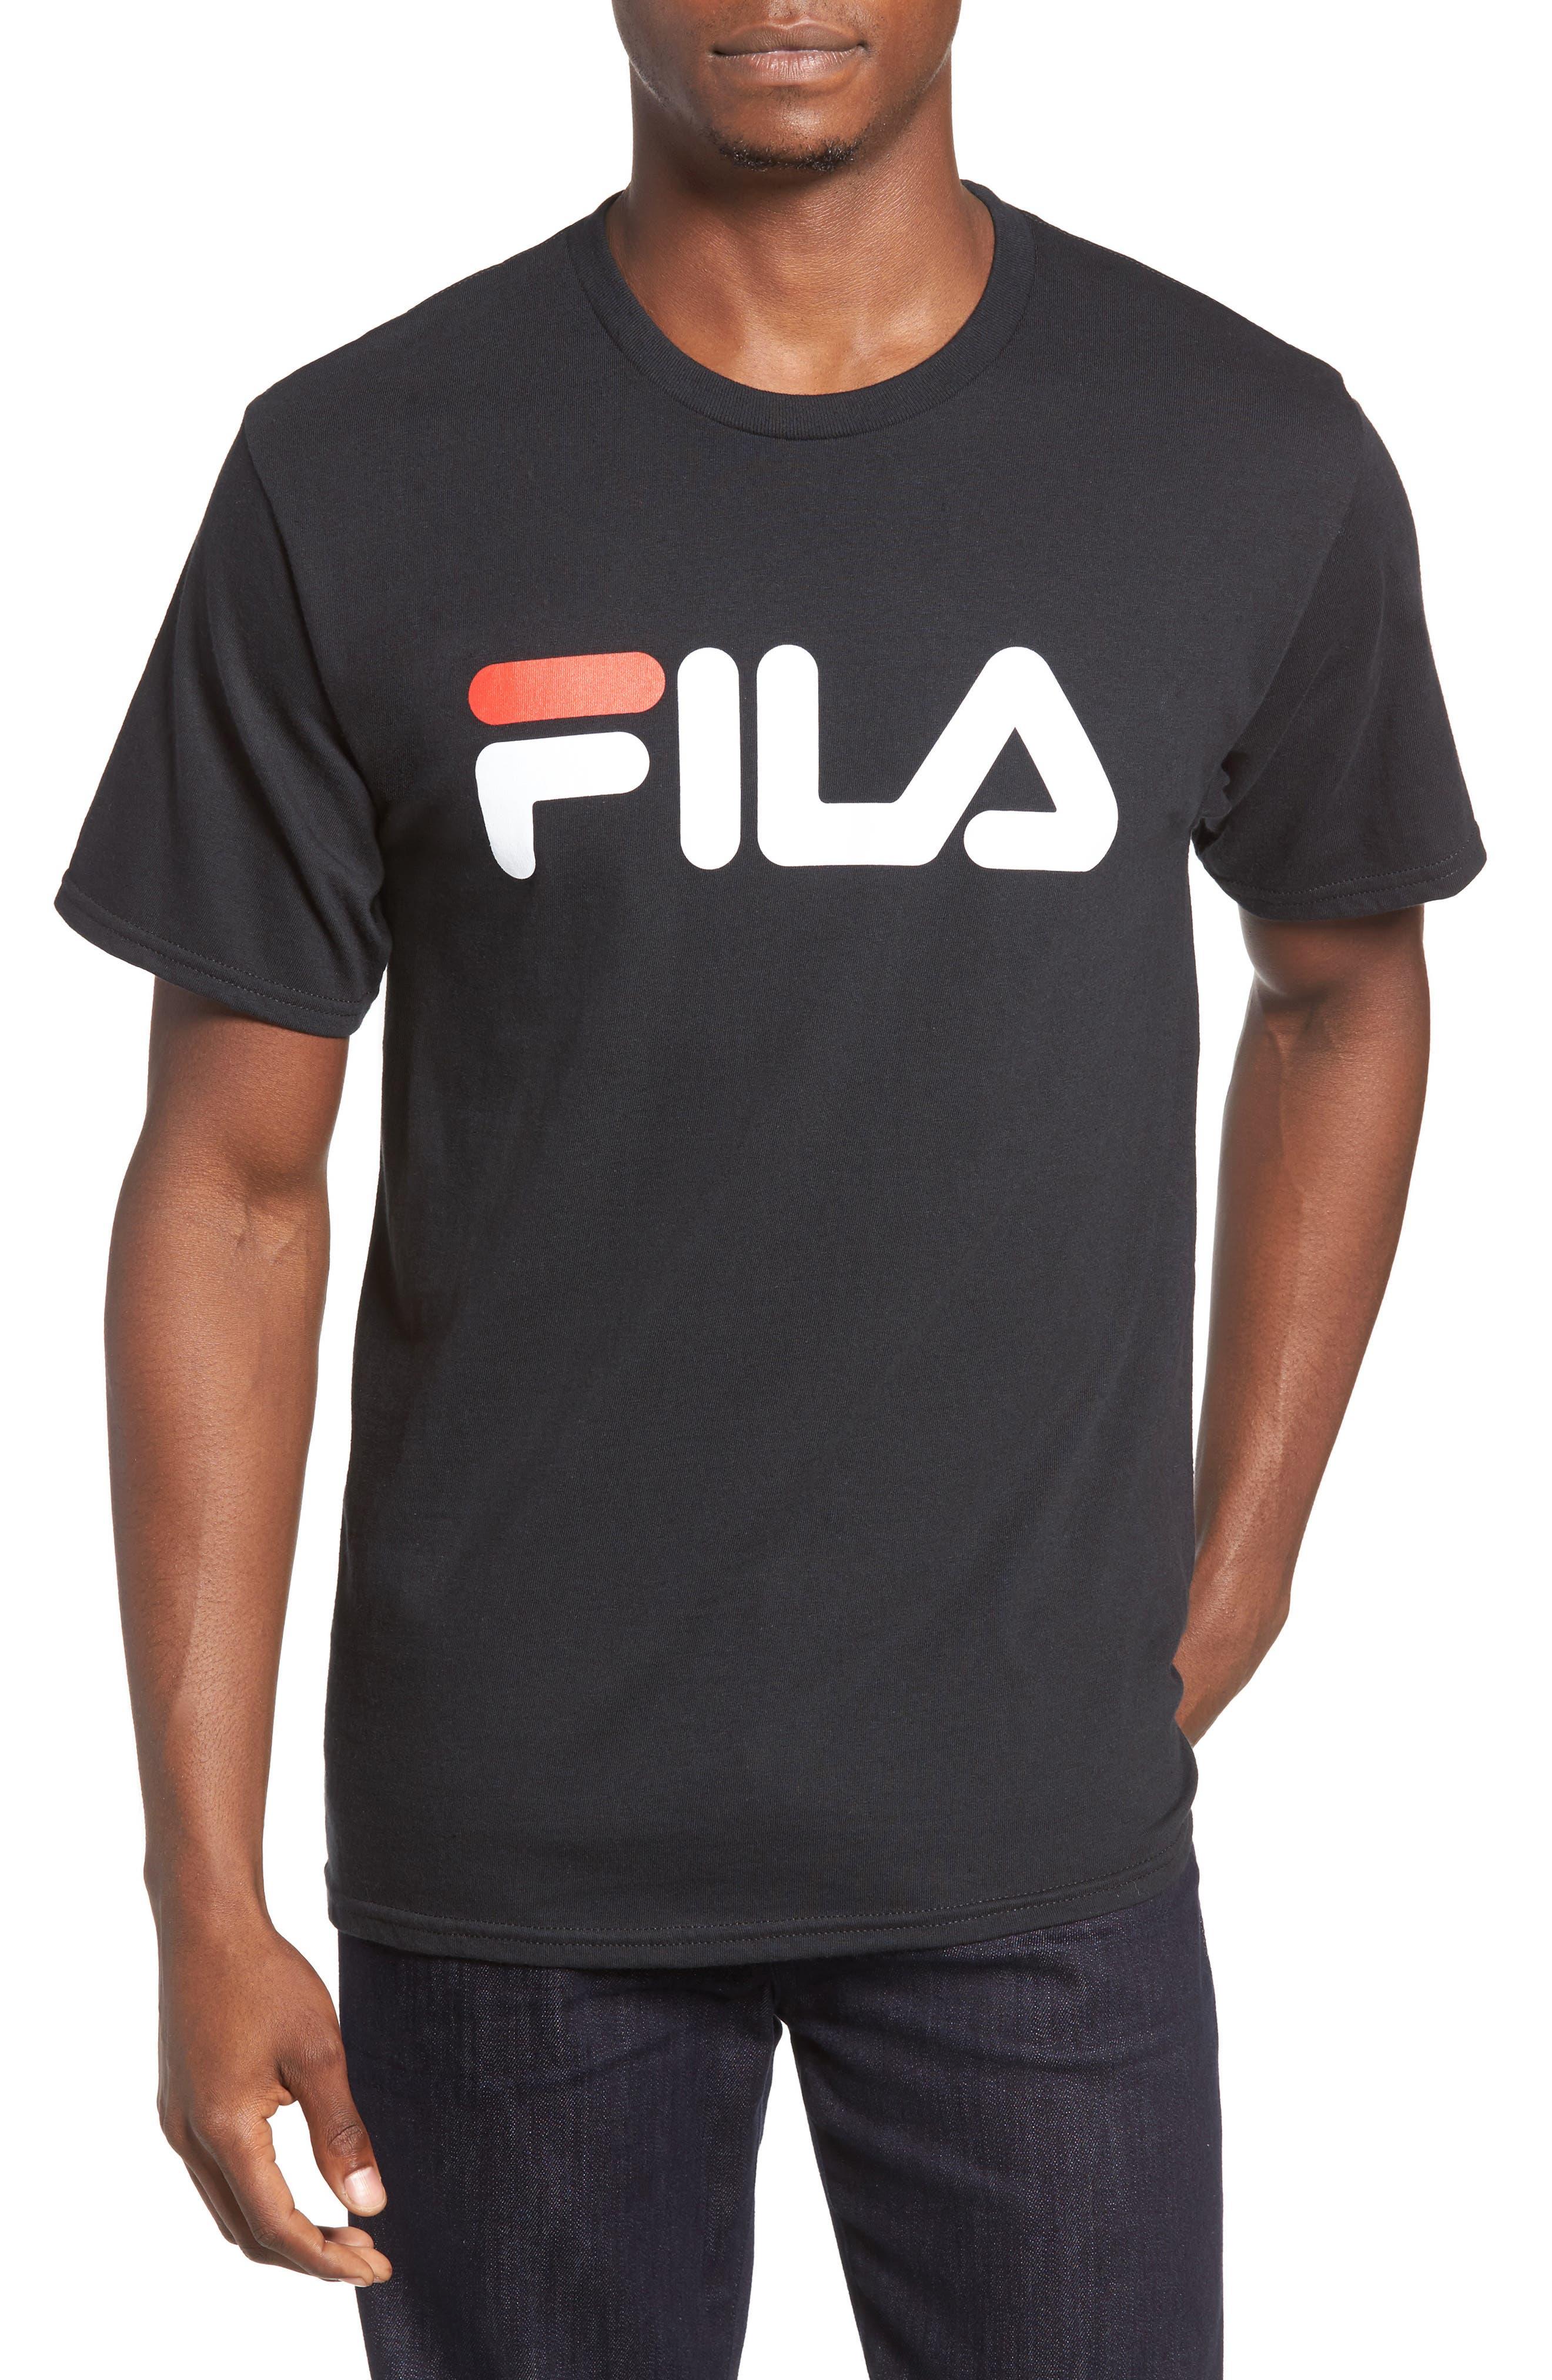 USA Graphic T-Shirt,                             Alternate thumbnail 8, color,